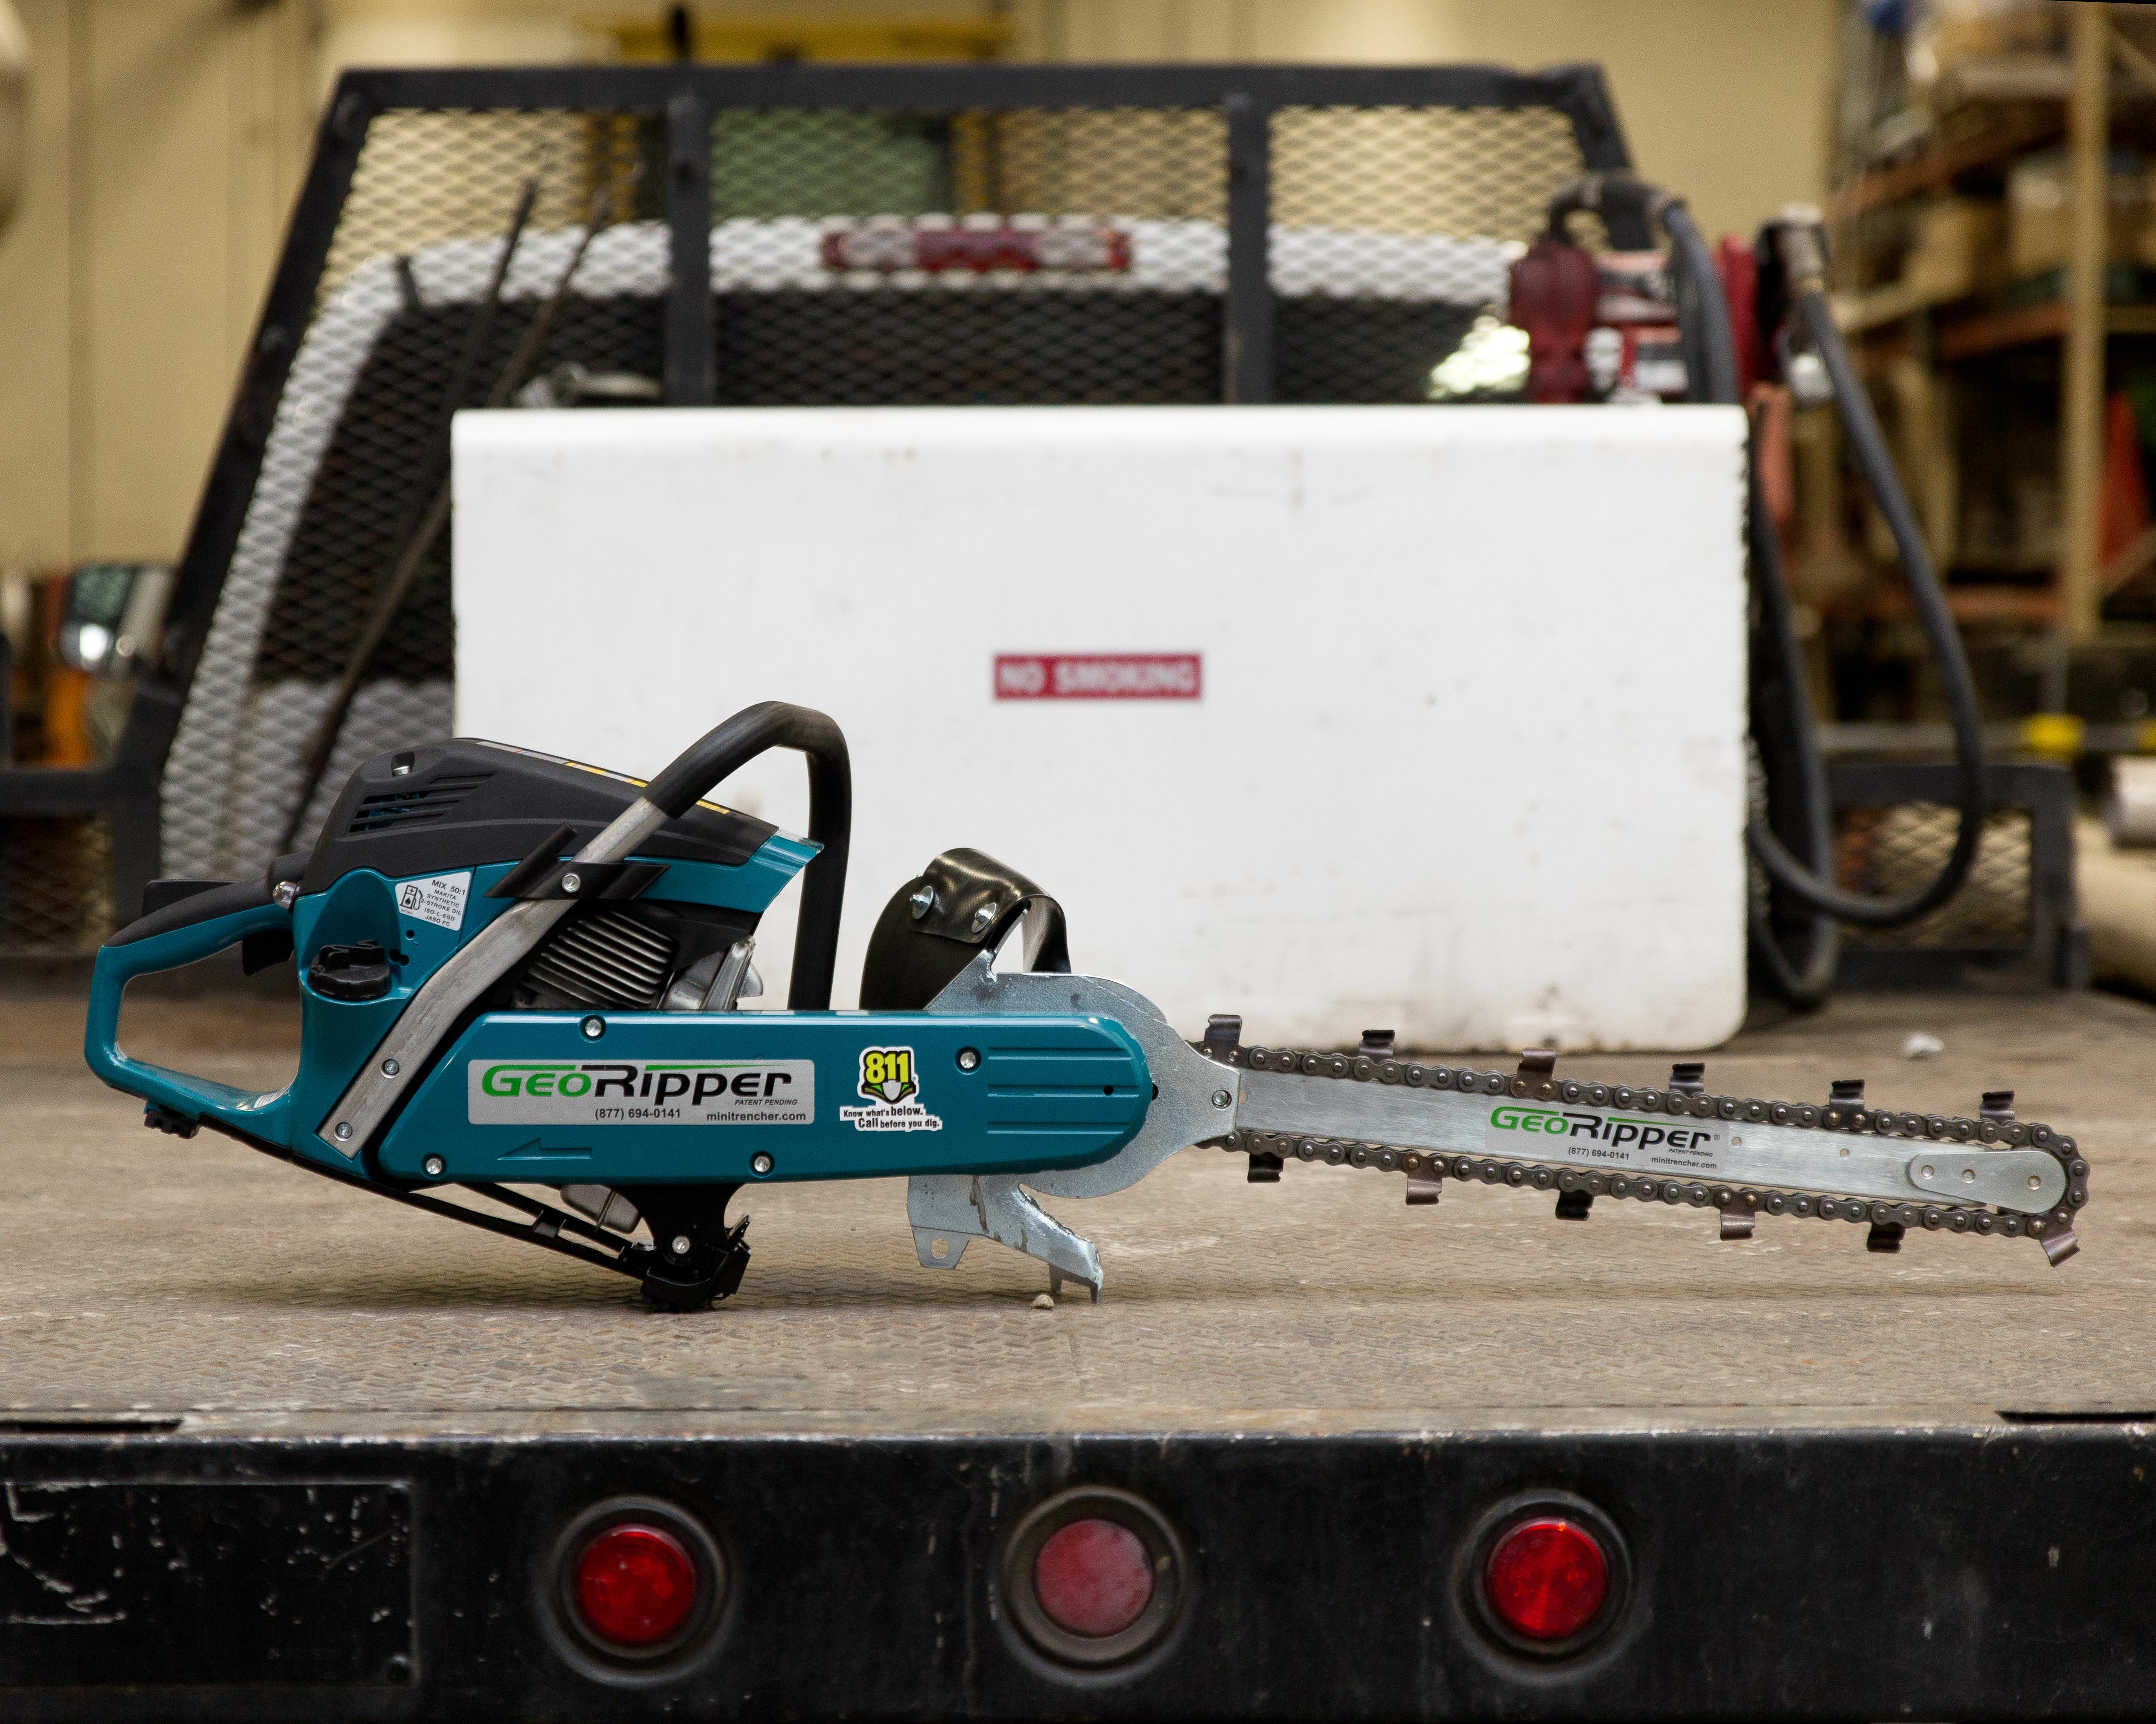 GeoRipper handheld trencher on truck